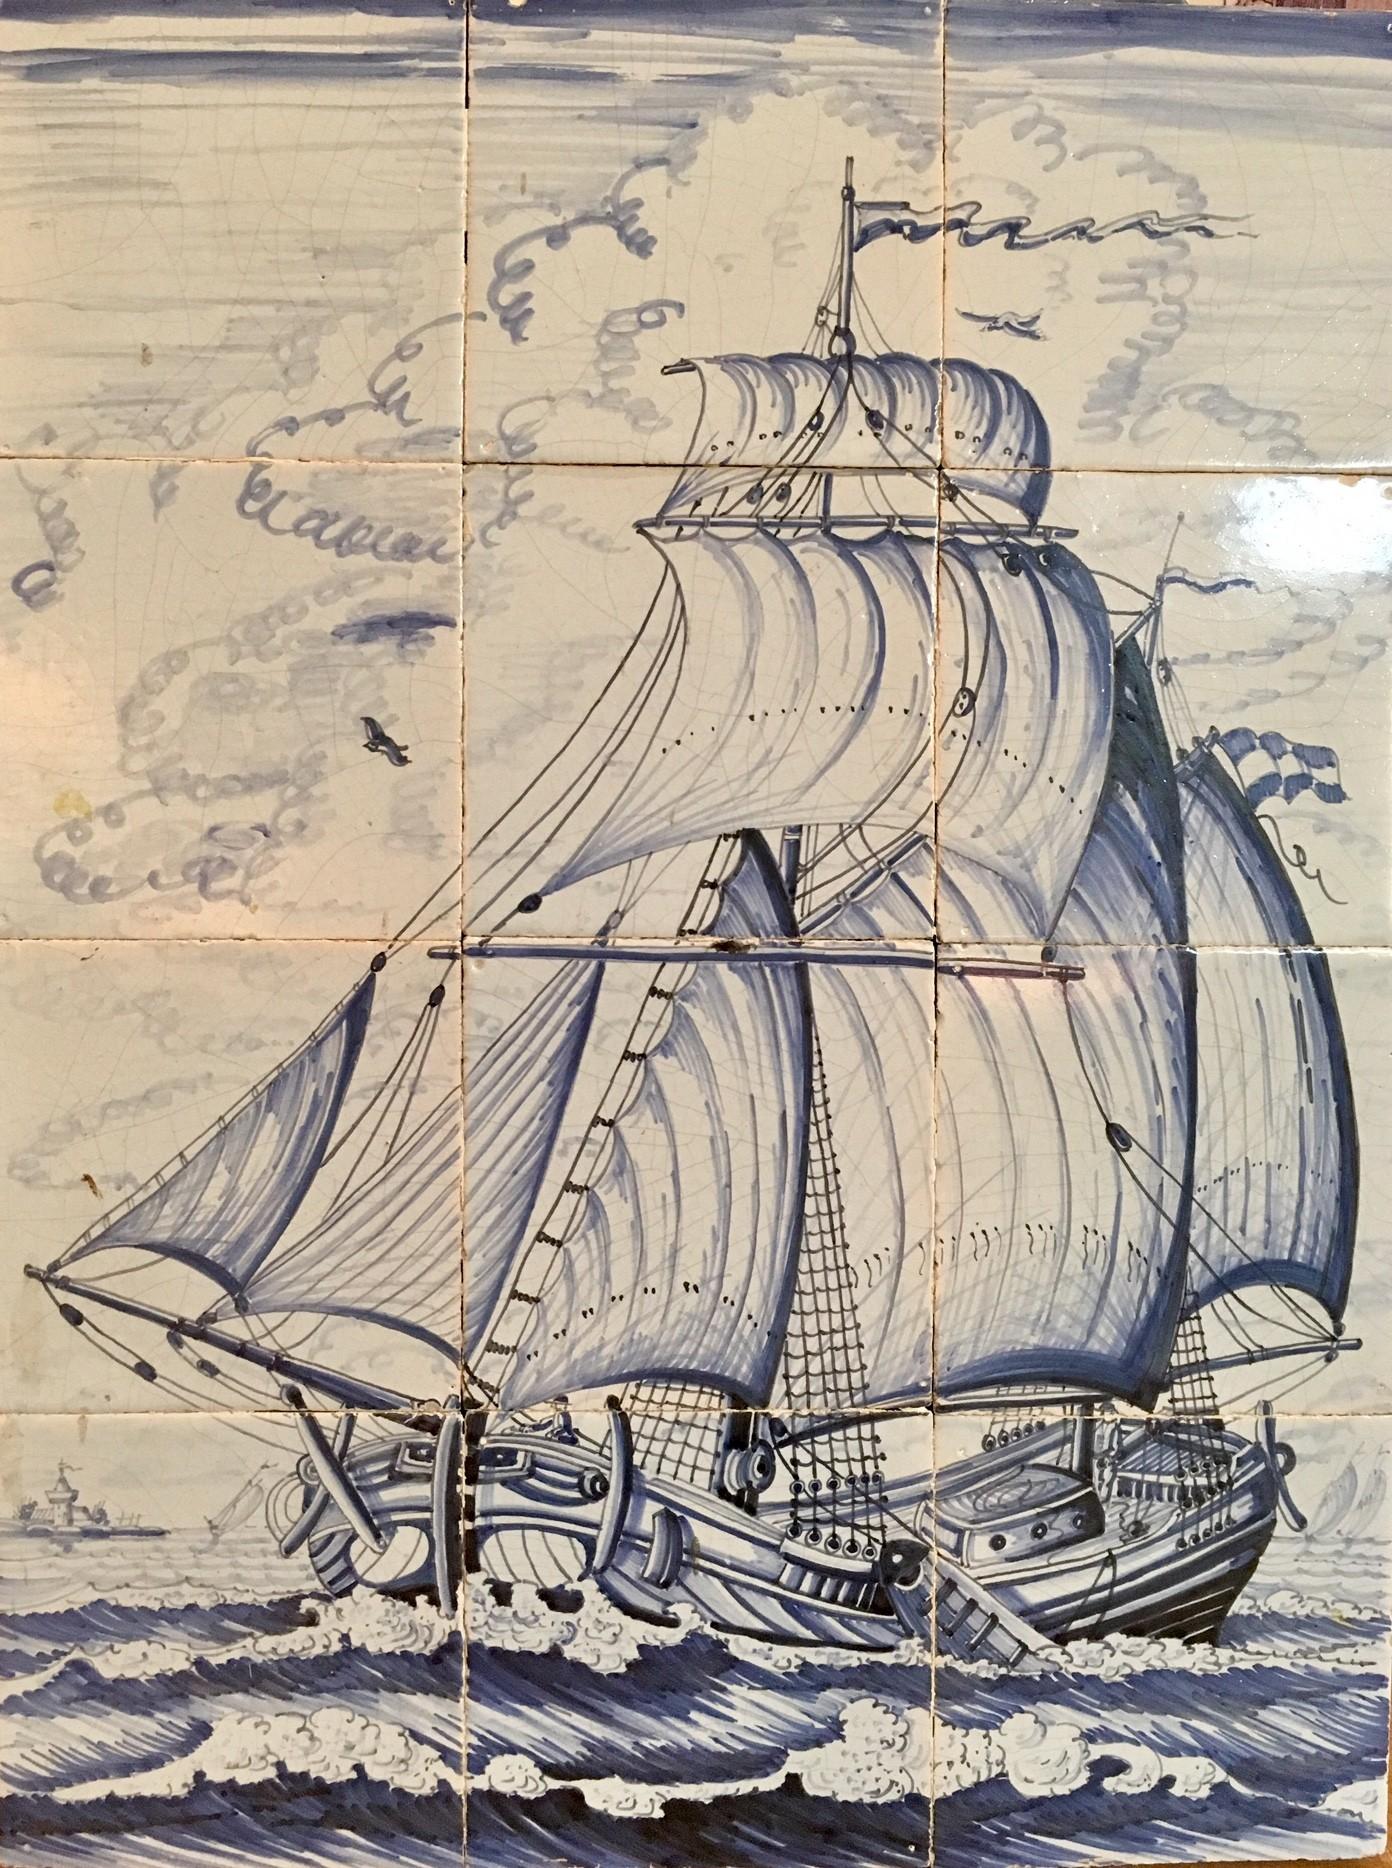 Tile tableau of sailing vessels